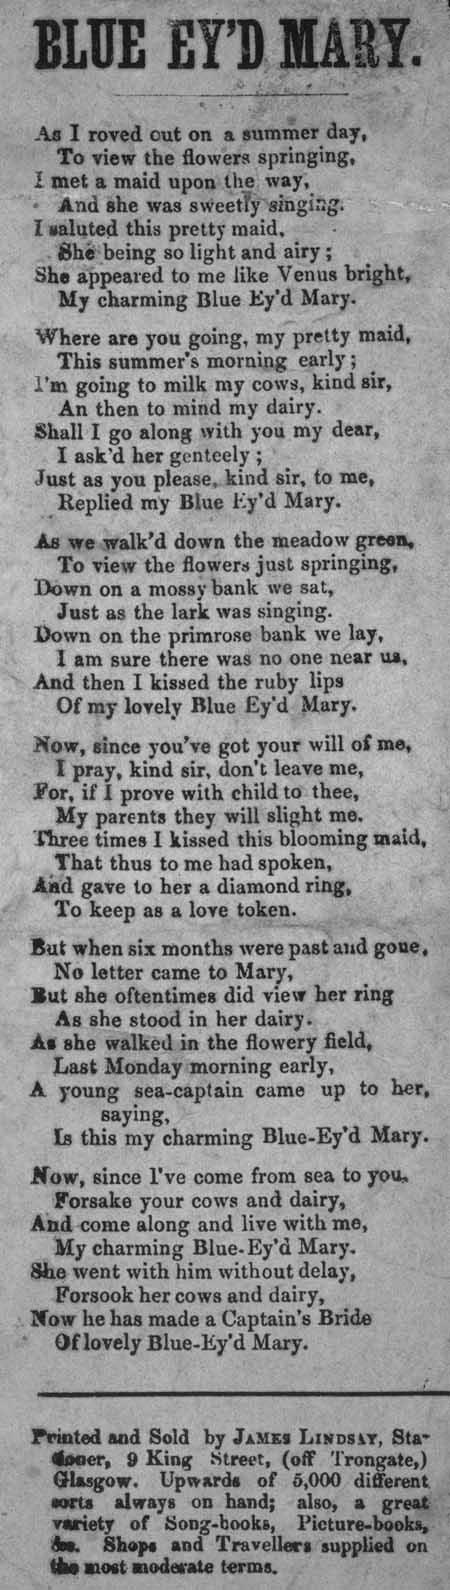 Broadside ballad entitled 'Blue Ey'd Mary'